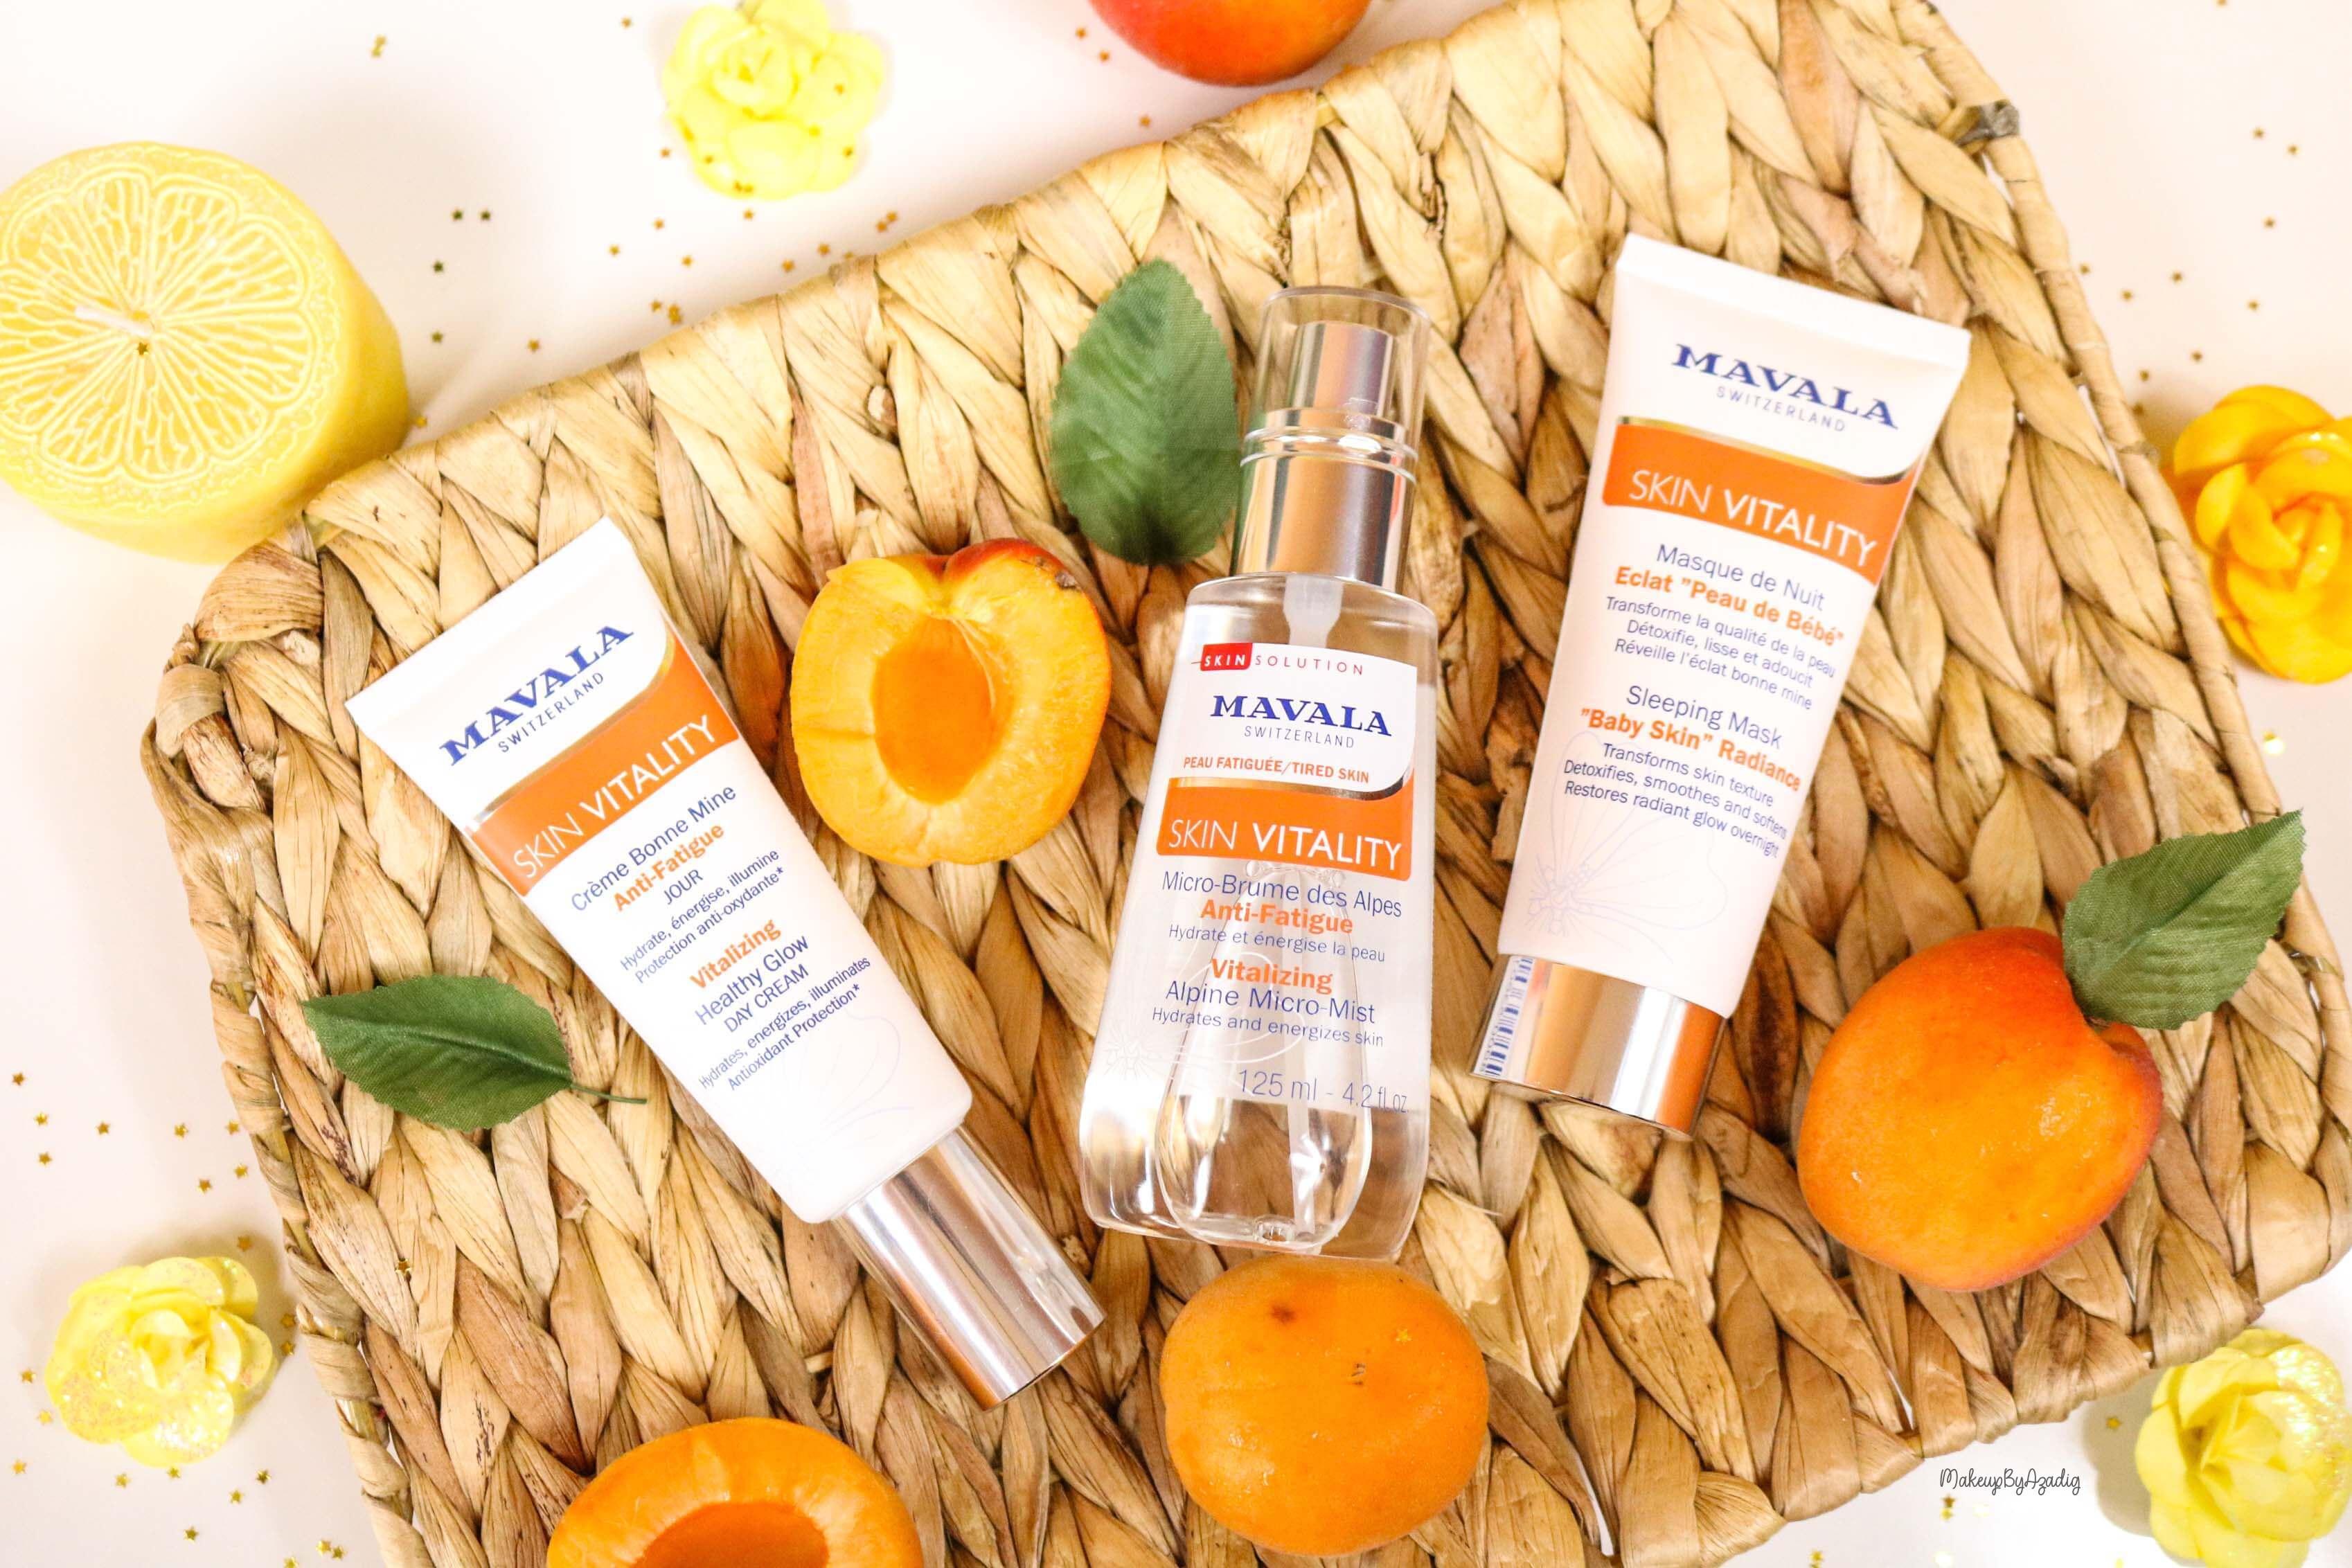 revue-routine-soin-bio-efficace-peau-sensible-skin-vitality-mavala-suisse-masque-nuit-serum-creme-jour-makeupbyazadig-apricot